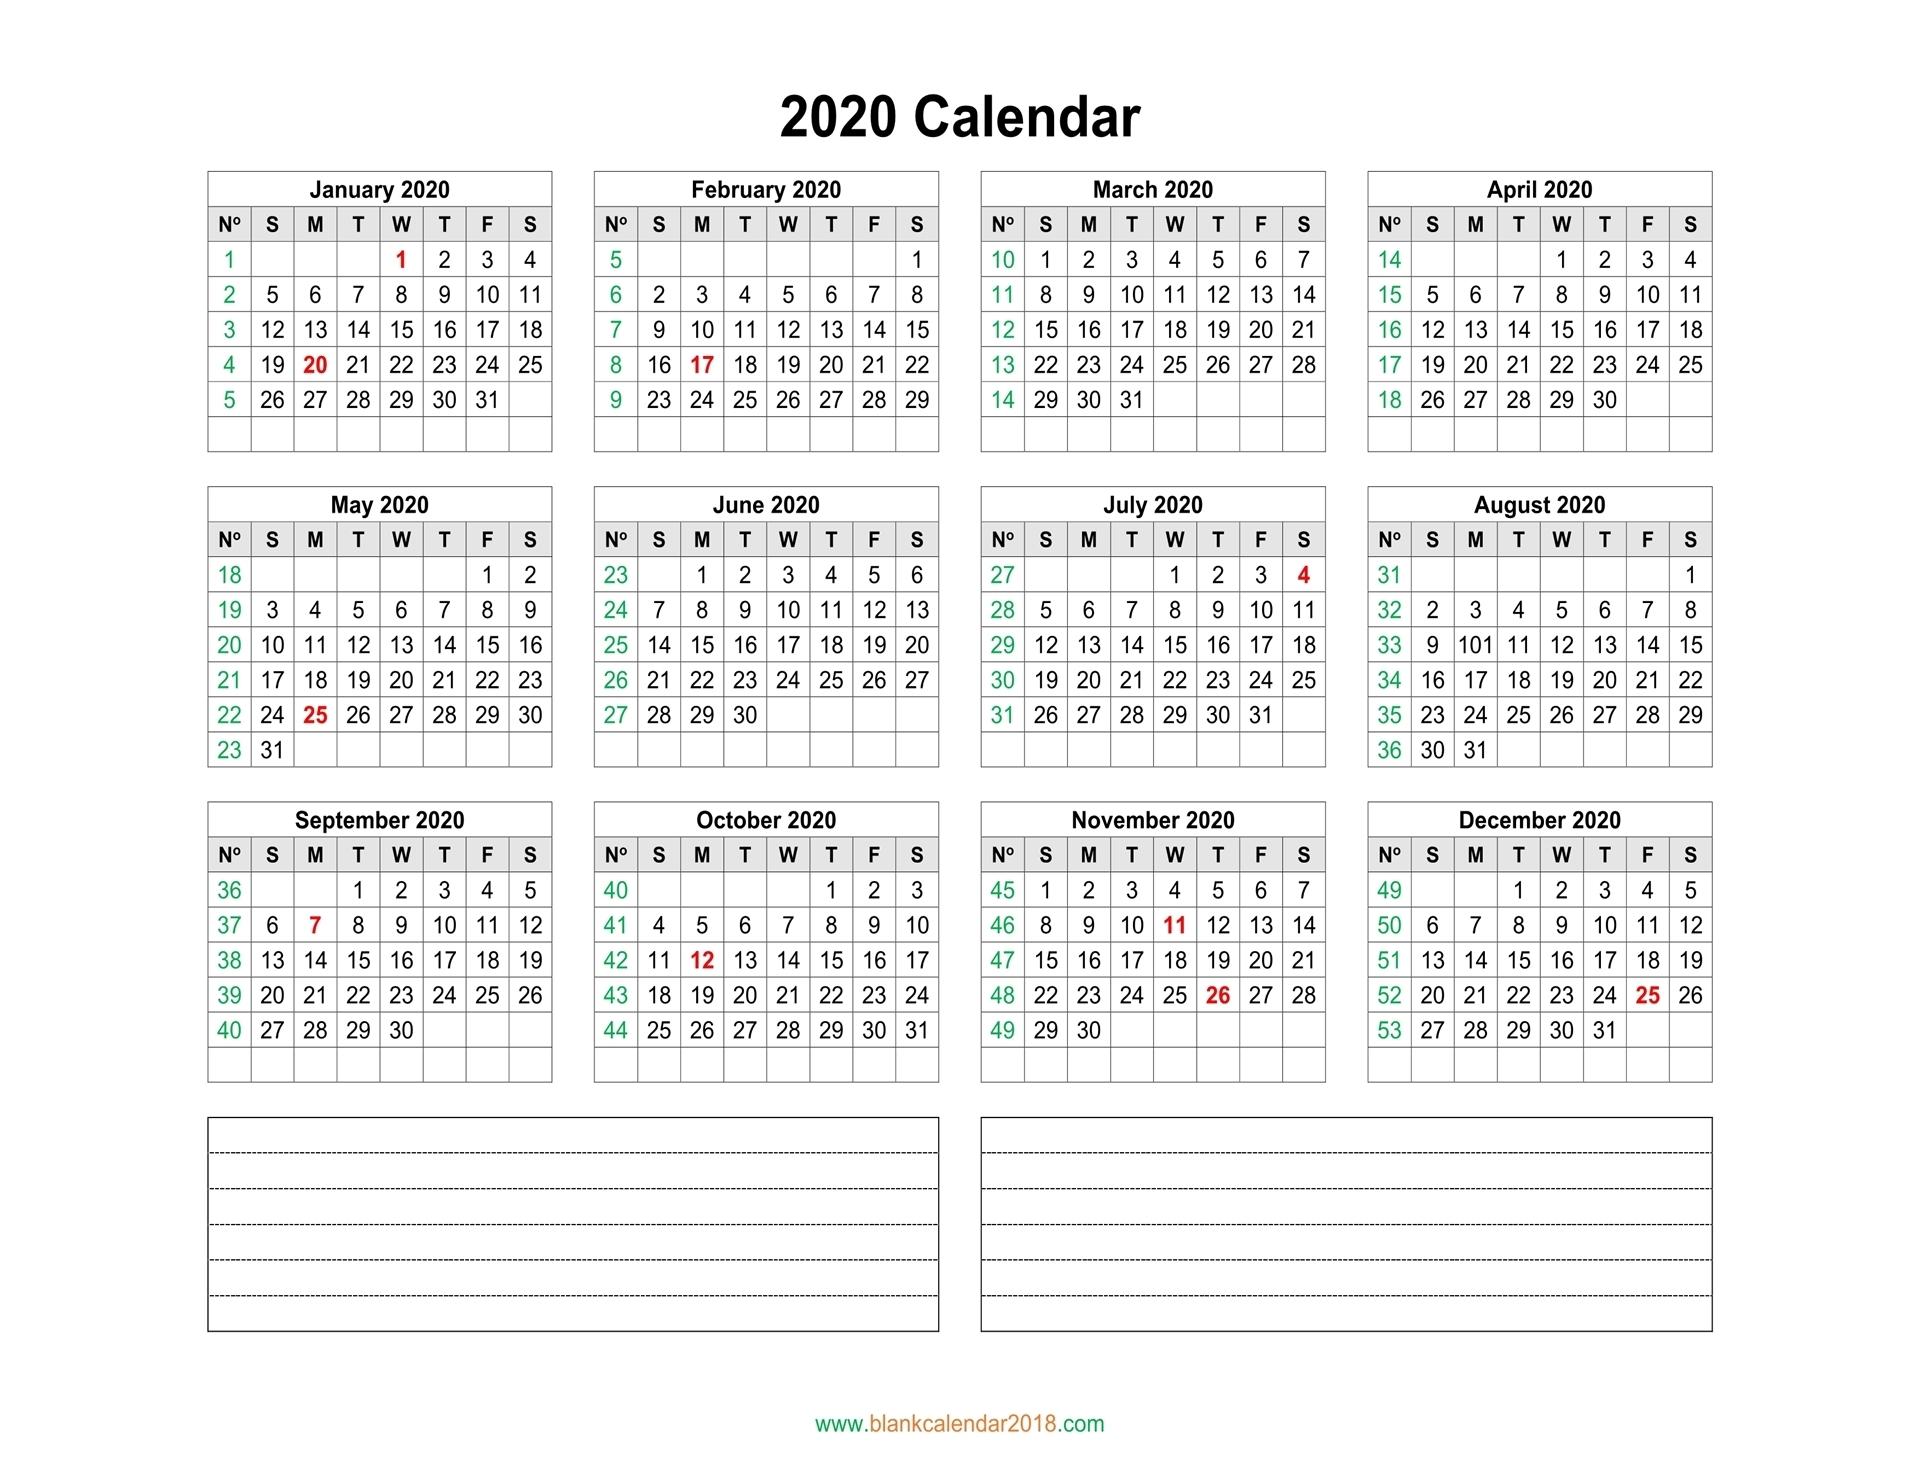 Blank Calendar 2020 regarding 2020 Calendar Free Printable With Space To Write